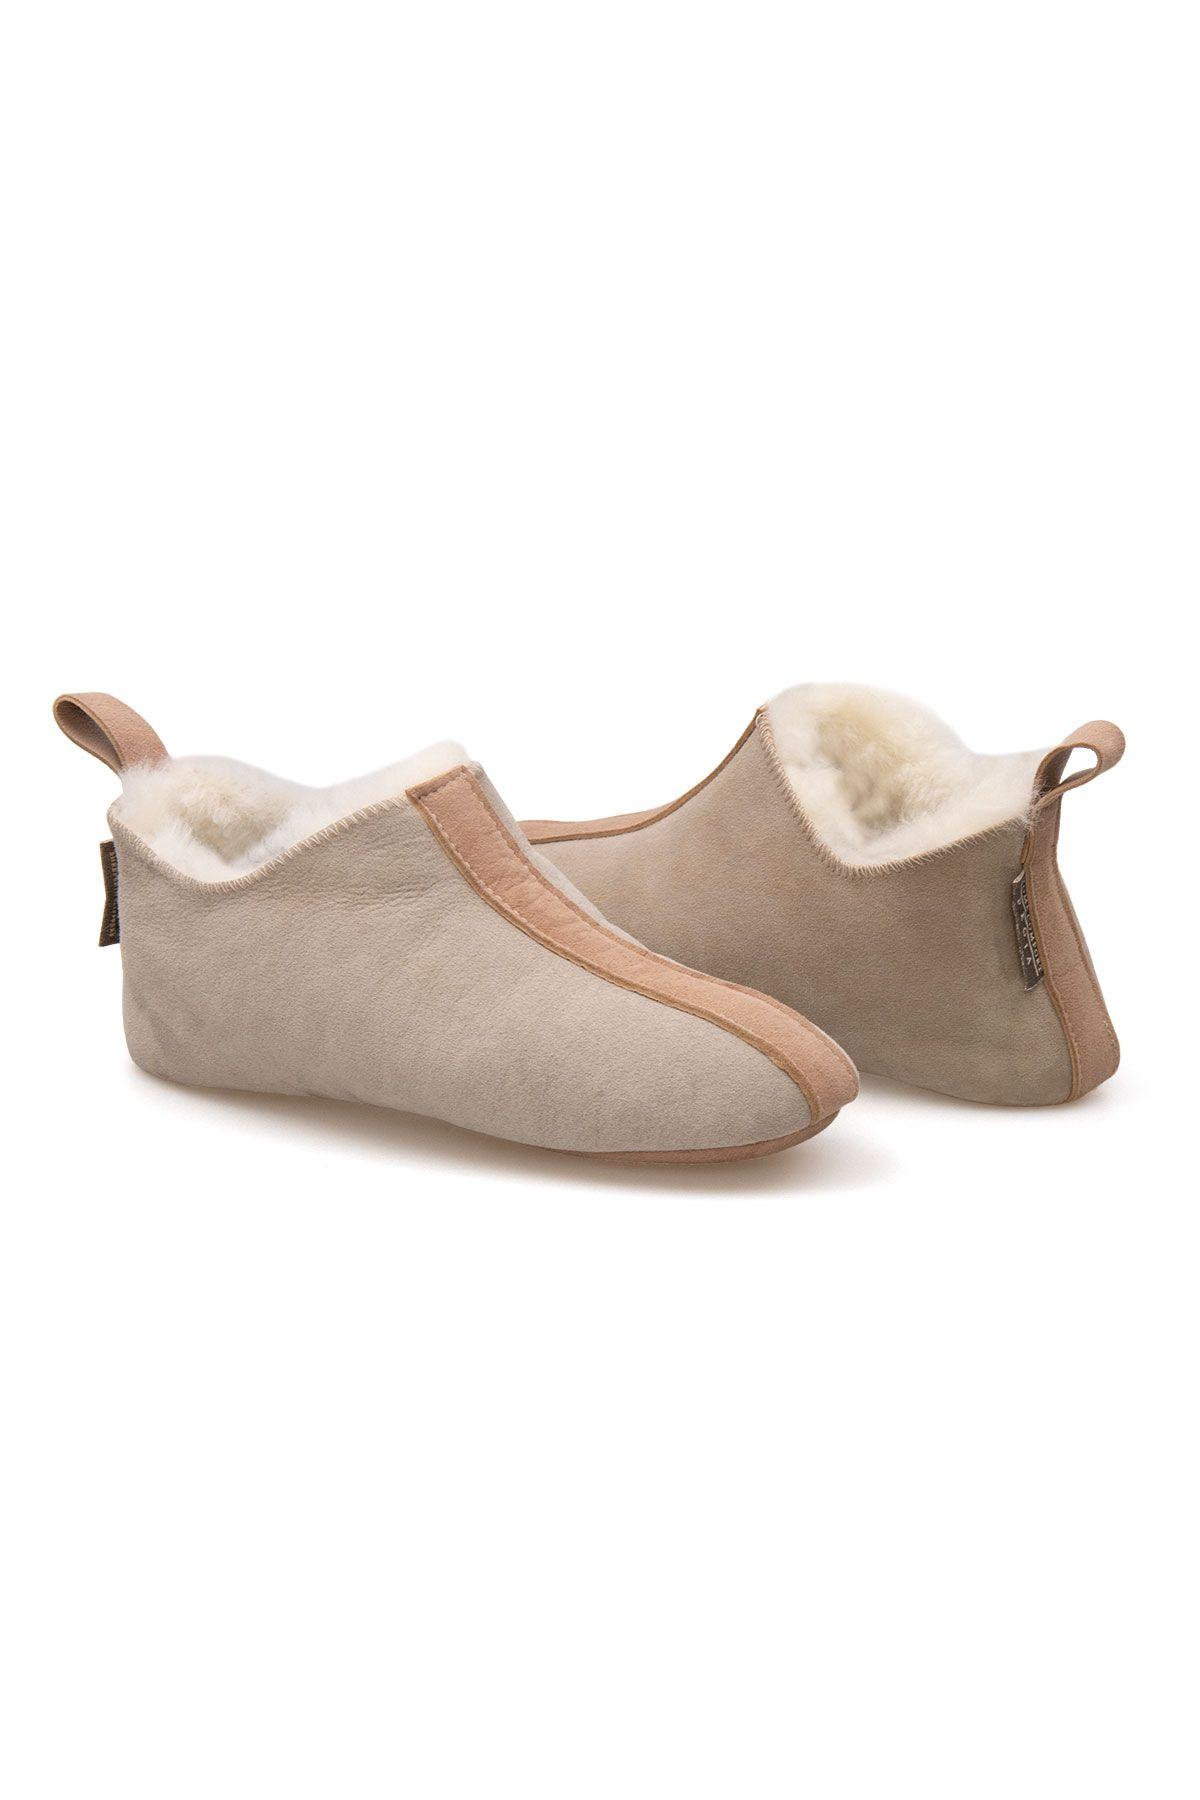 Pegia Women's Shearling House Shoes 980710 Beige